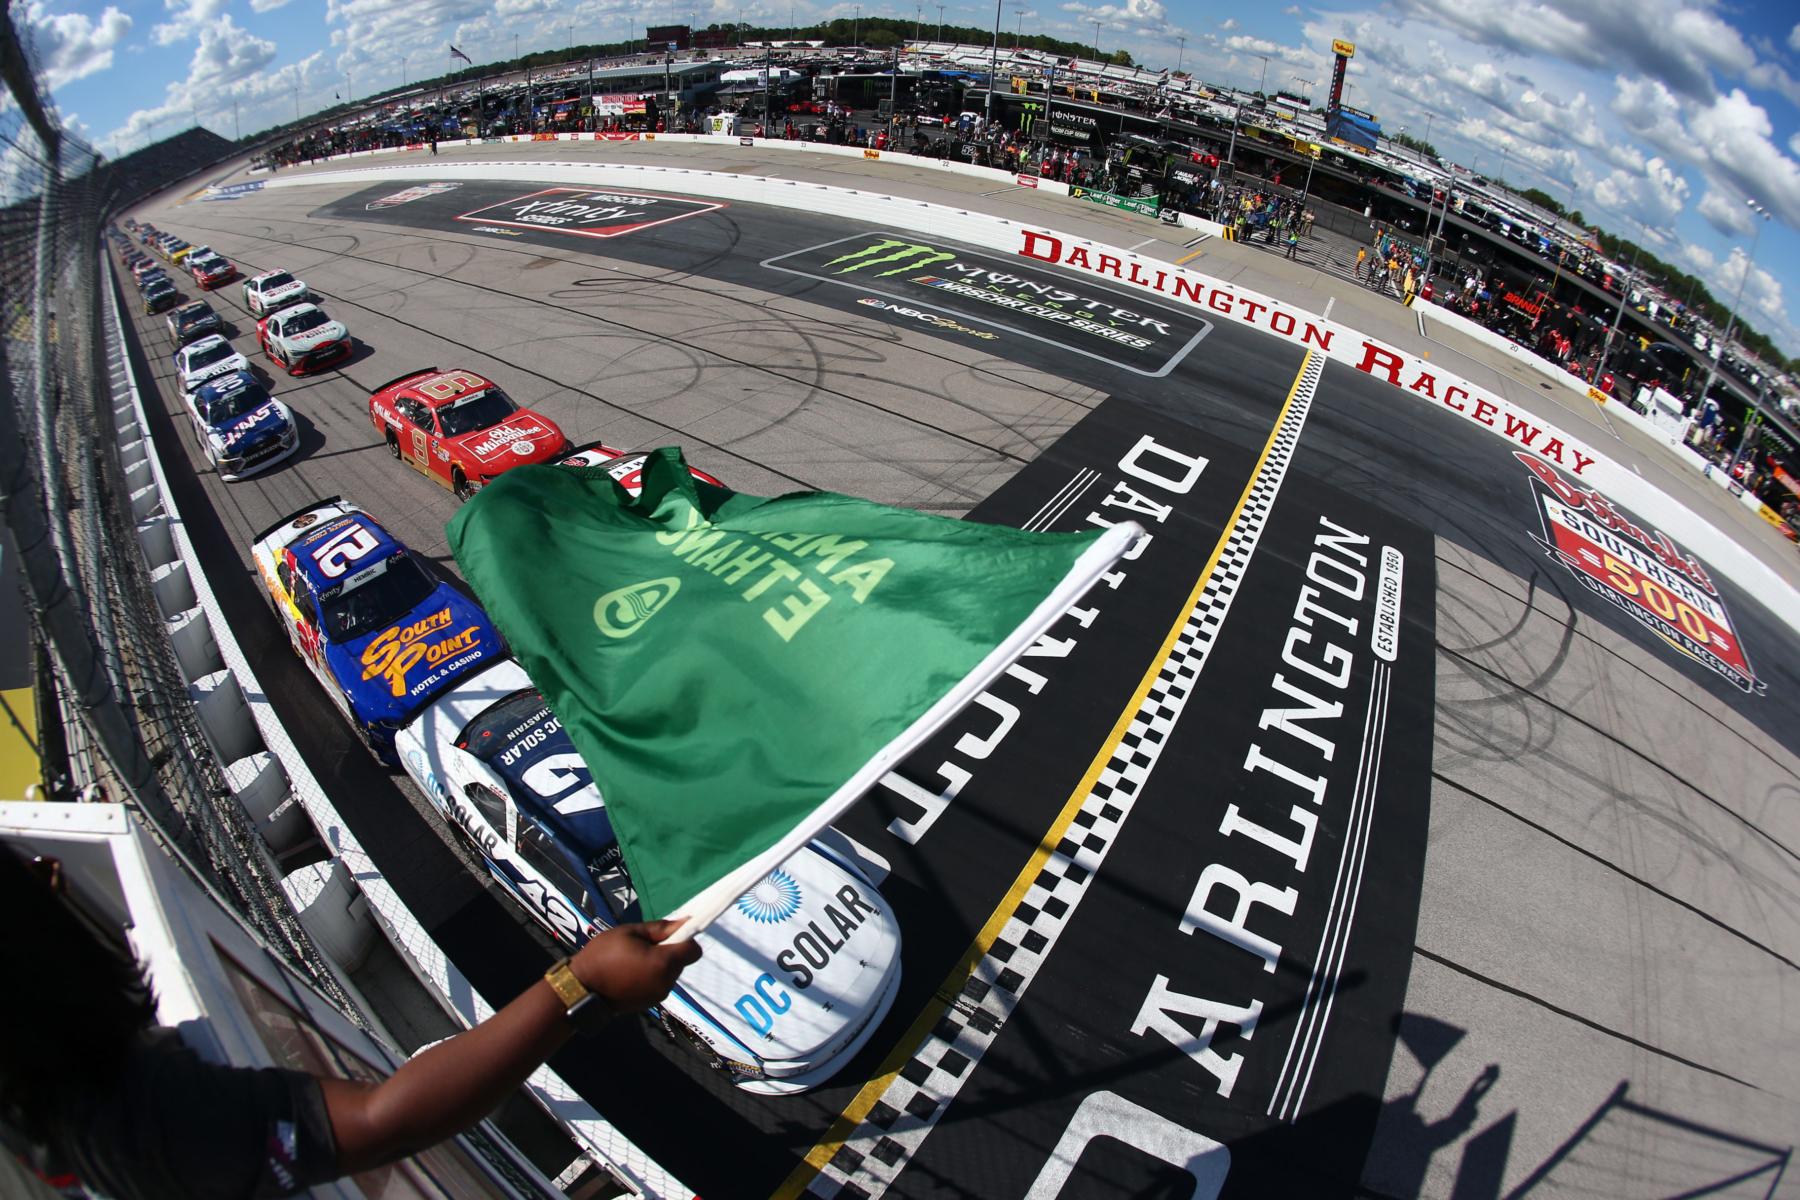 NASCAR Xfinity Series at Darlington Raceway